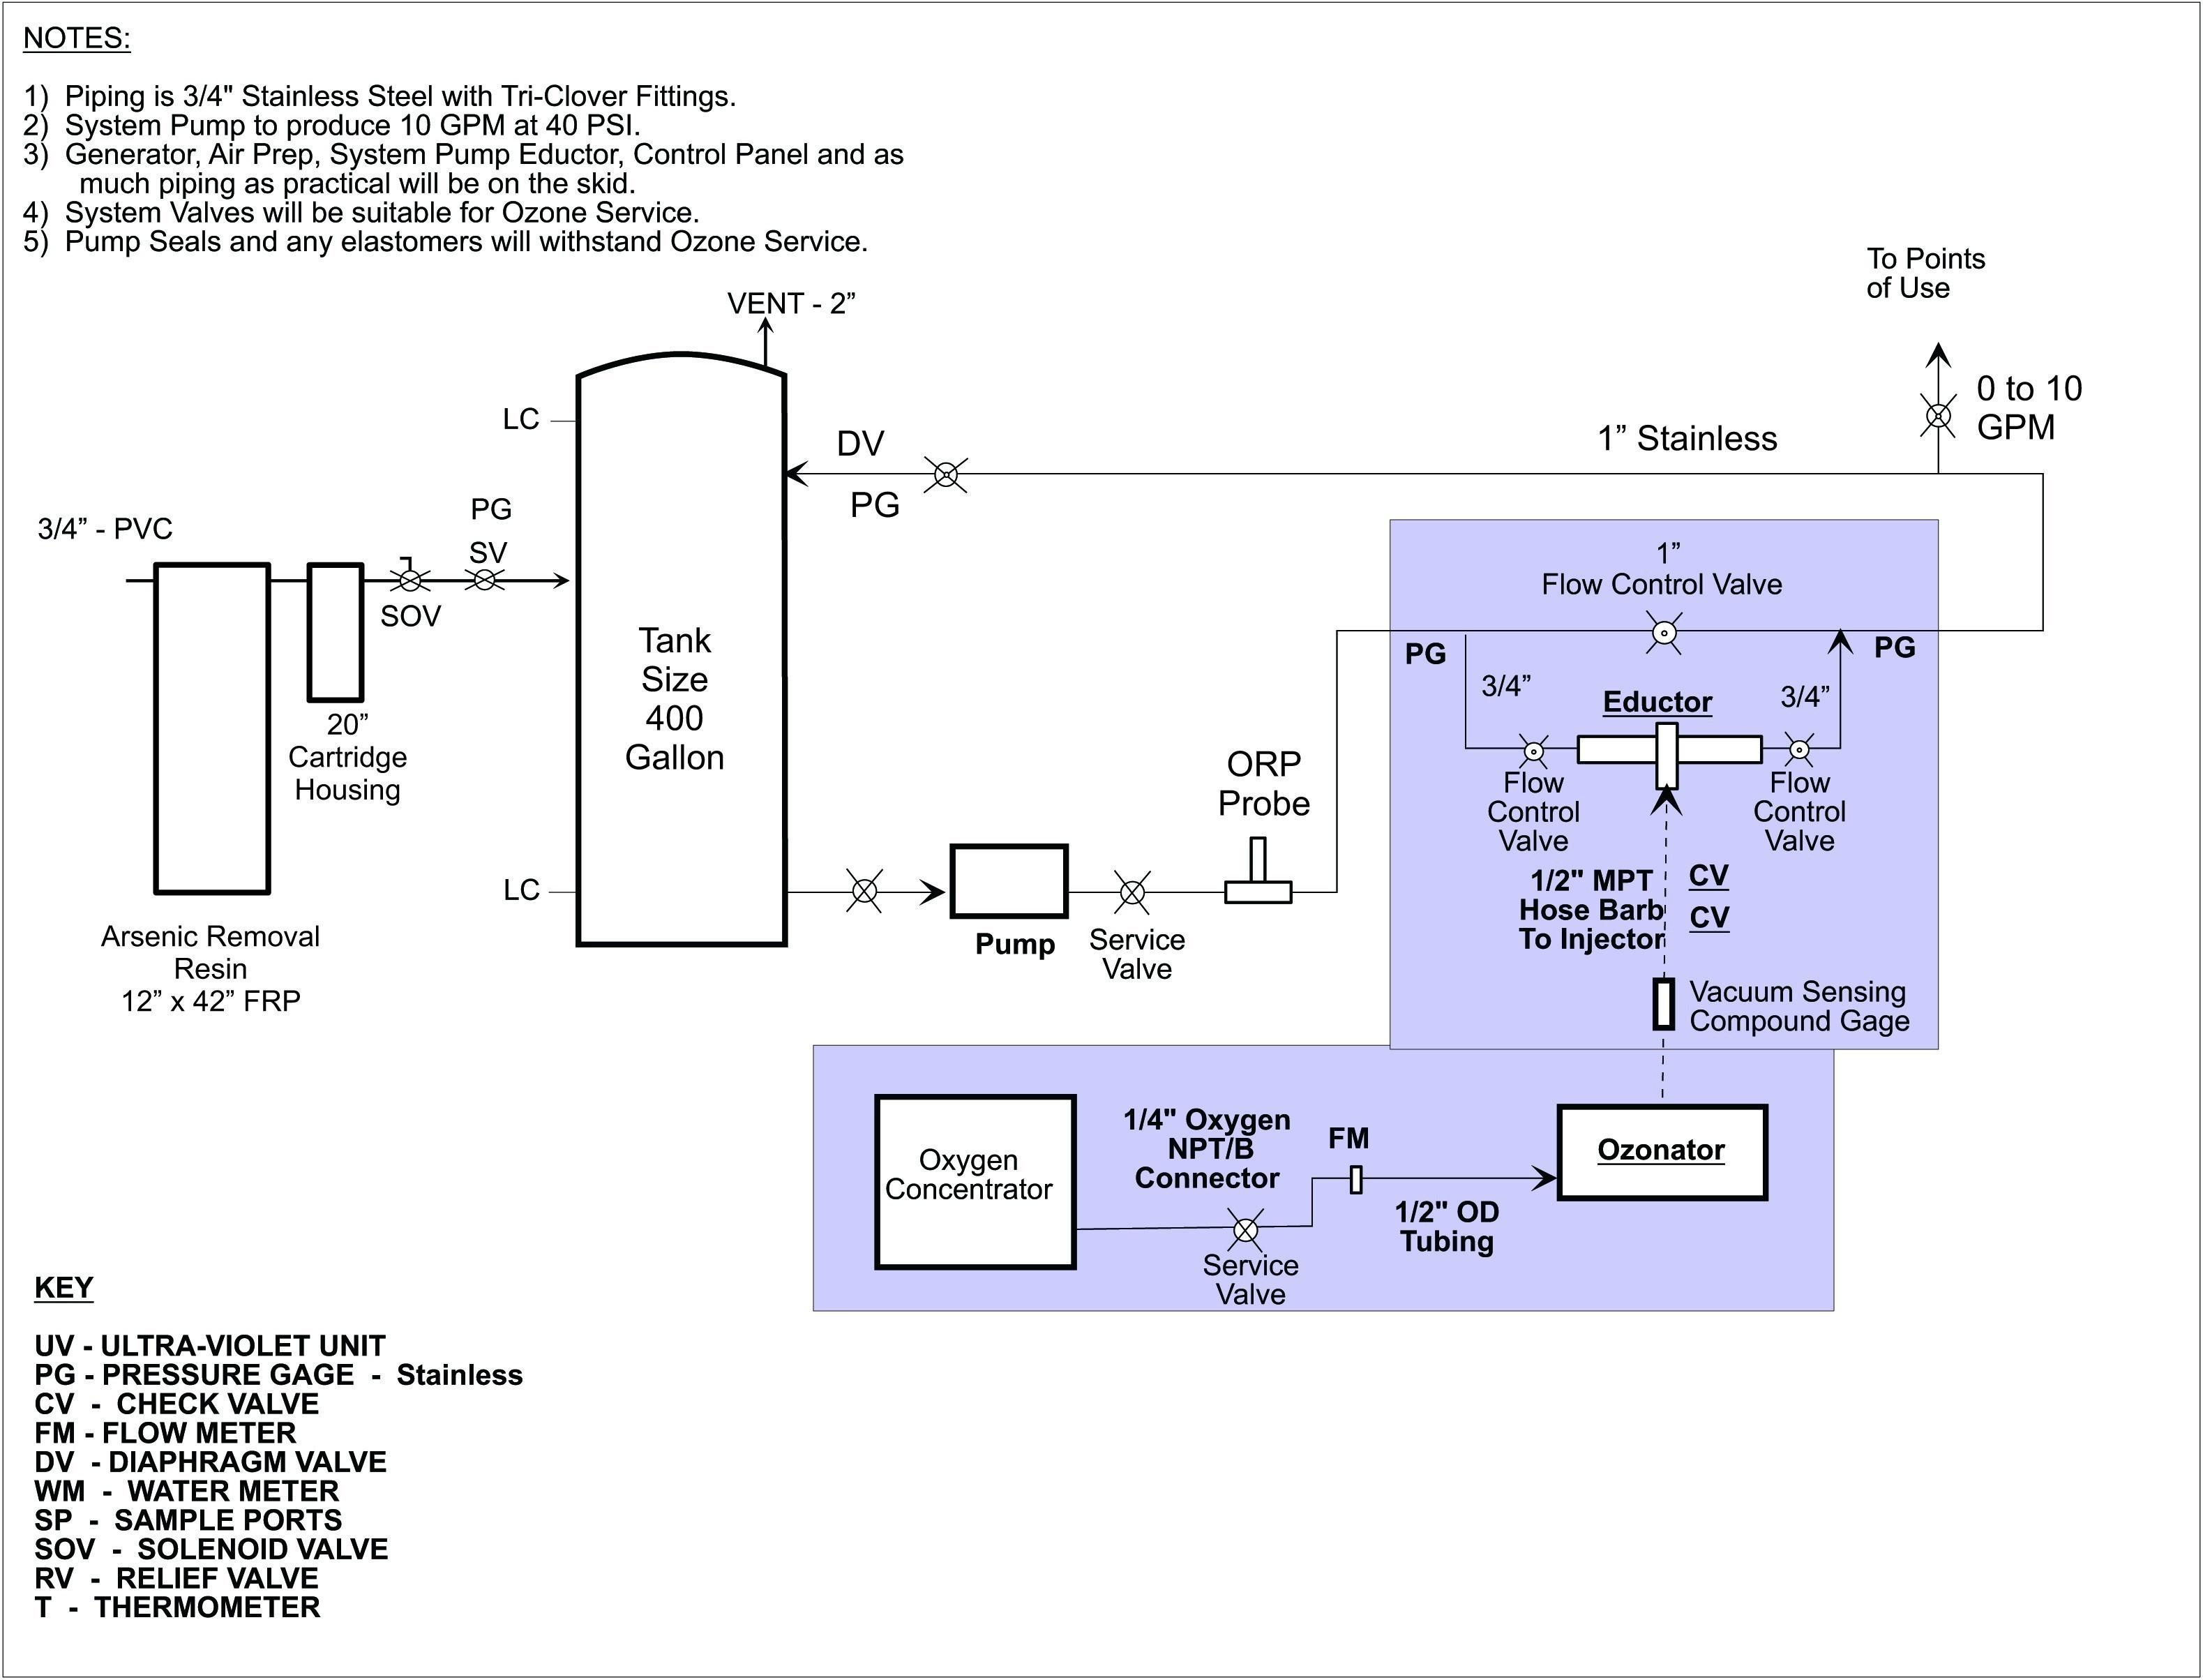 Diy solar Panel Wiring Diagram Rv solar Panel Installation Rv 3 Battery Wiring Diagram Dhads Of Diy solar Panel Wiring Diagram